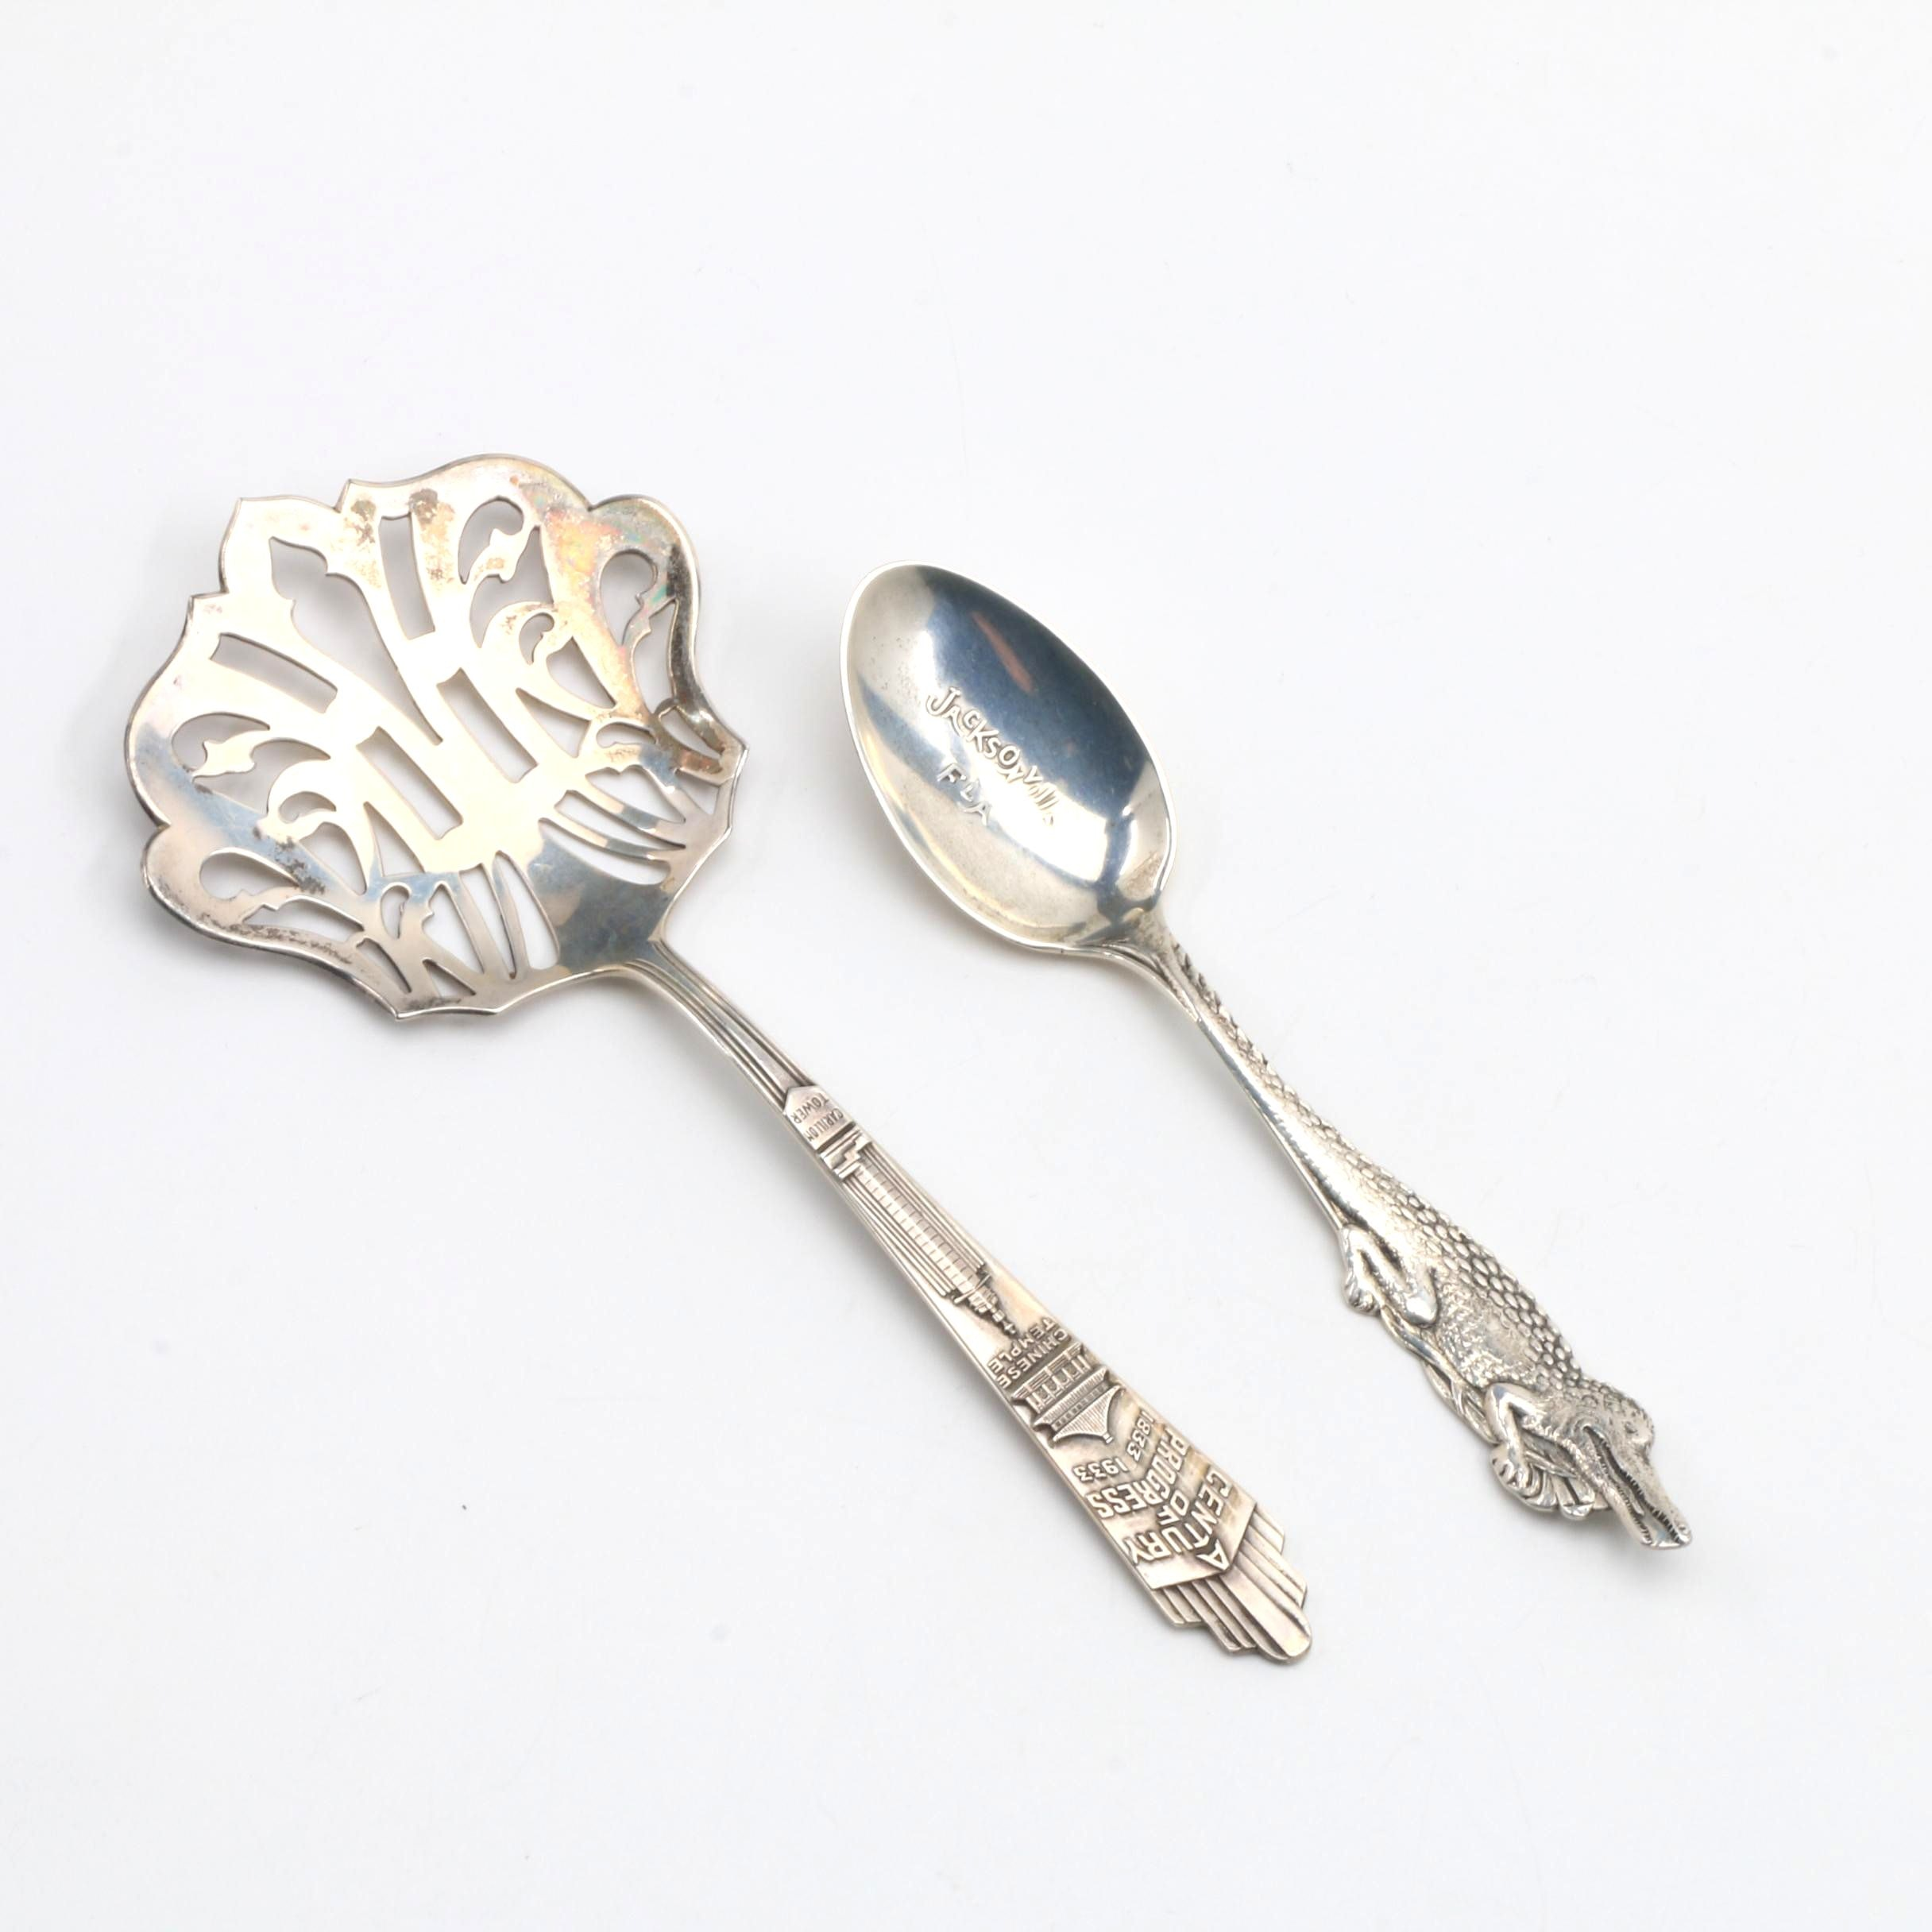 Pair of Sterling Silver Souvenir Flatware